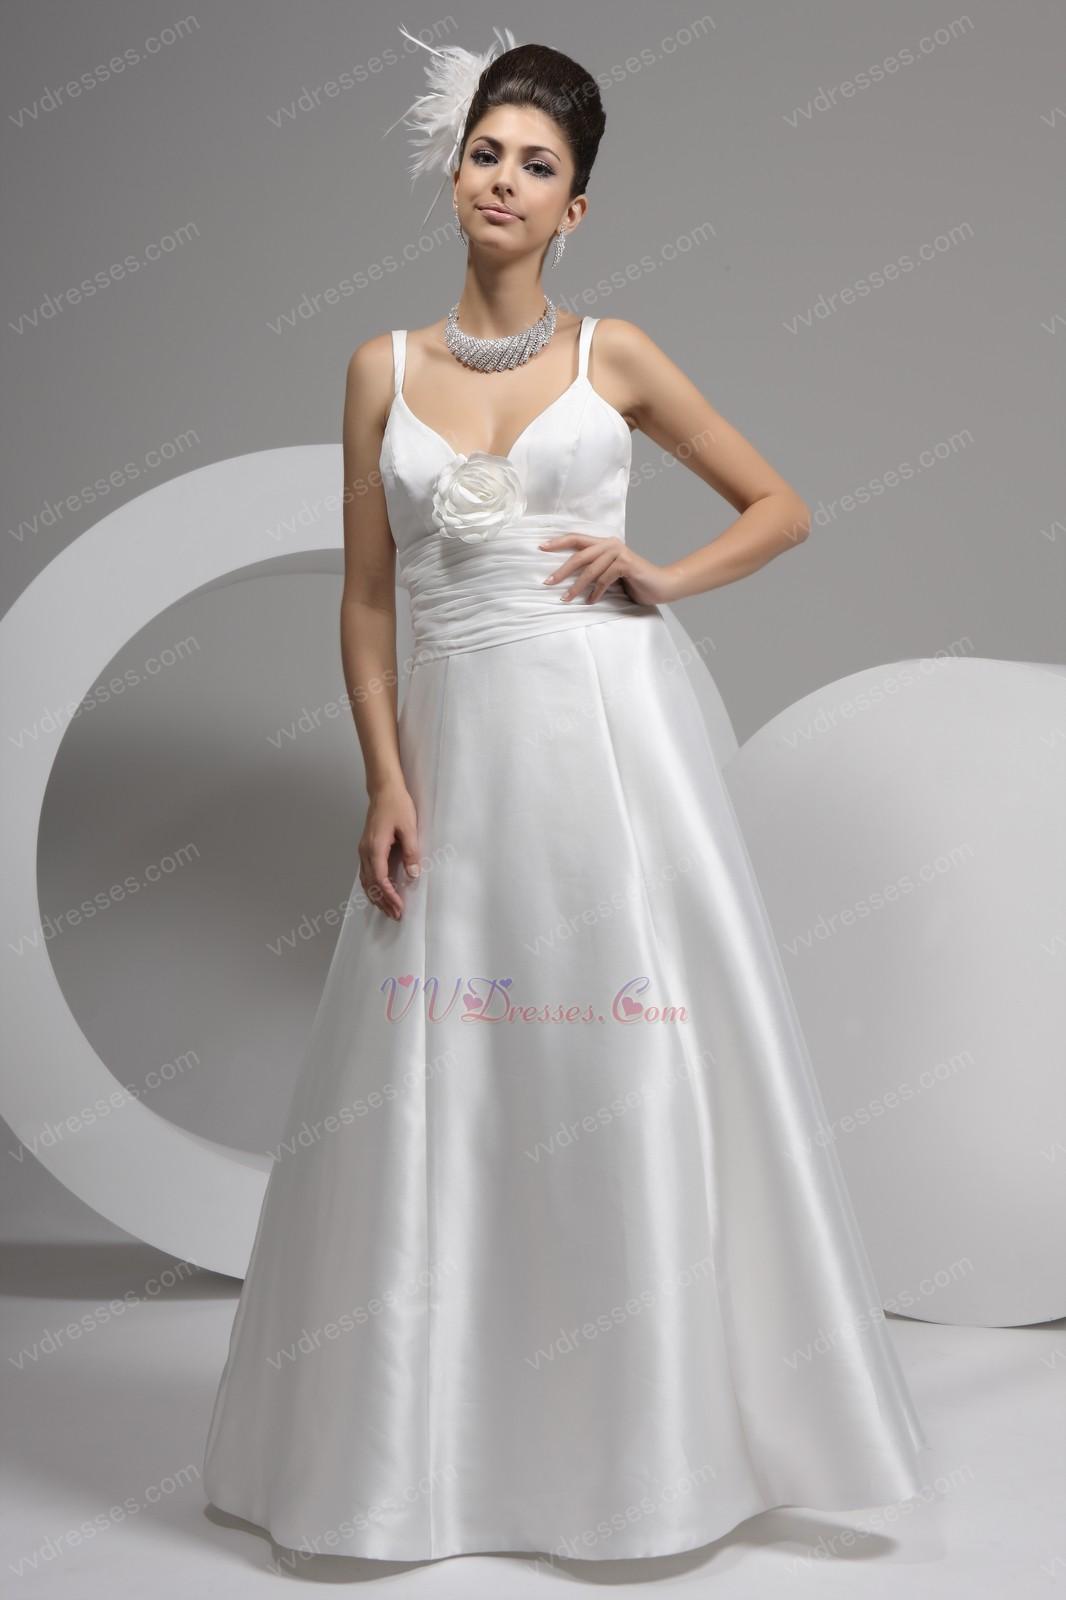 Simple Spaghetti Straps A Line Beach Wedding Dress